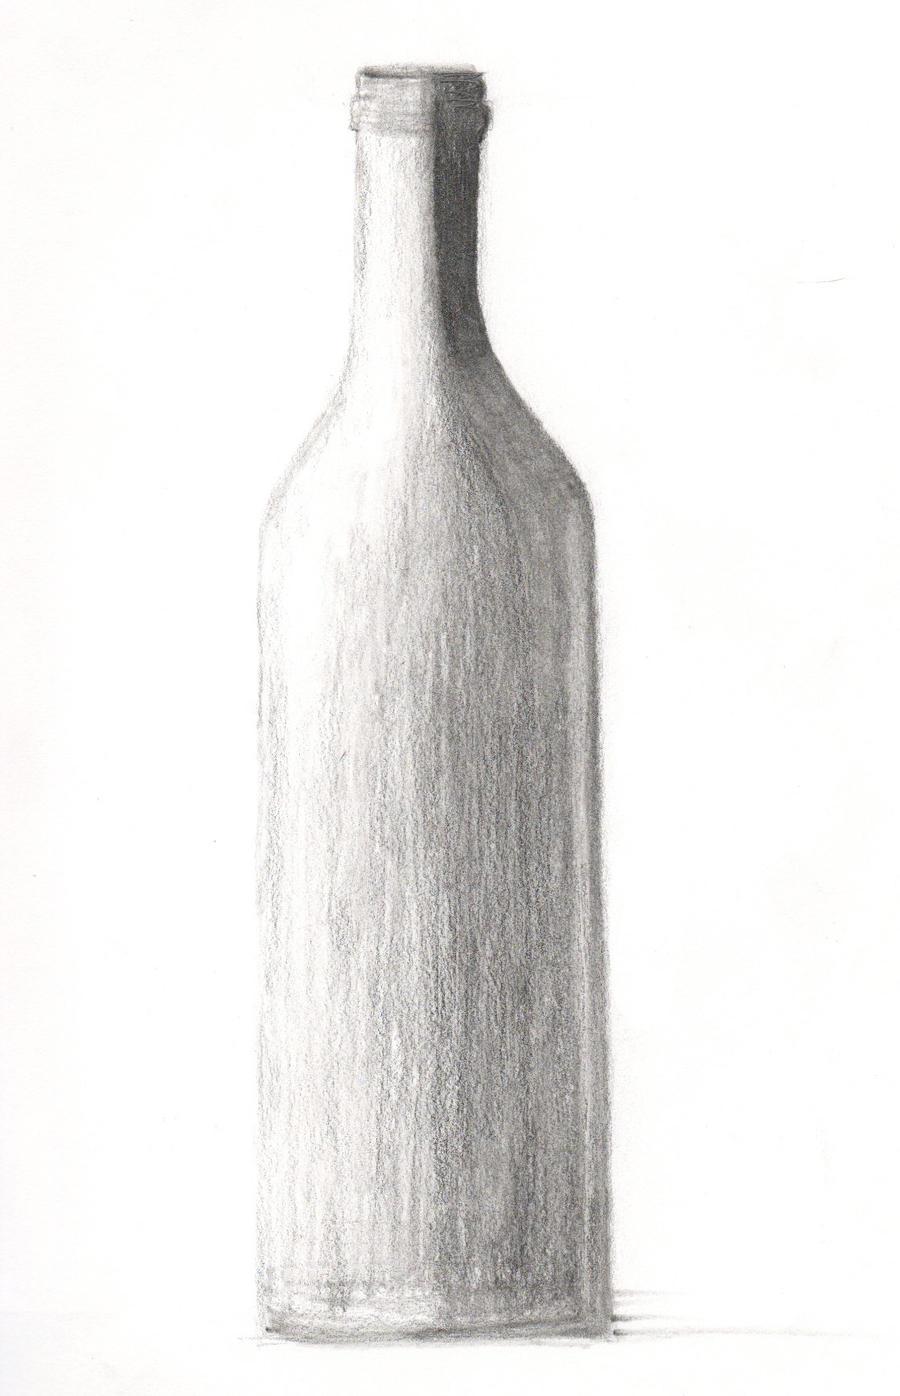 Drawing 101 - Wine Bottle 1 by xycolsen on DeviantArt